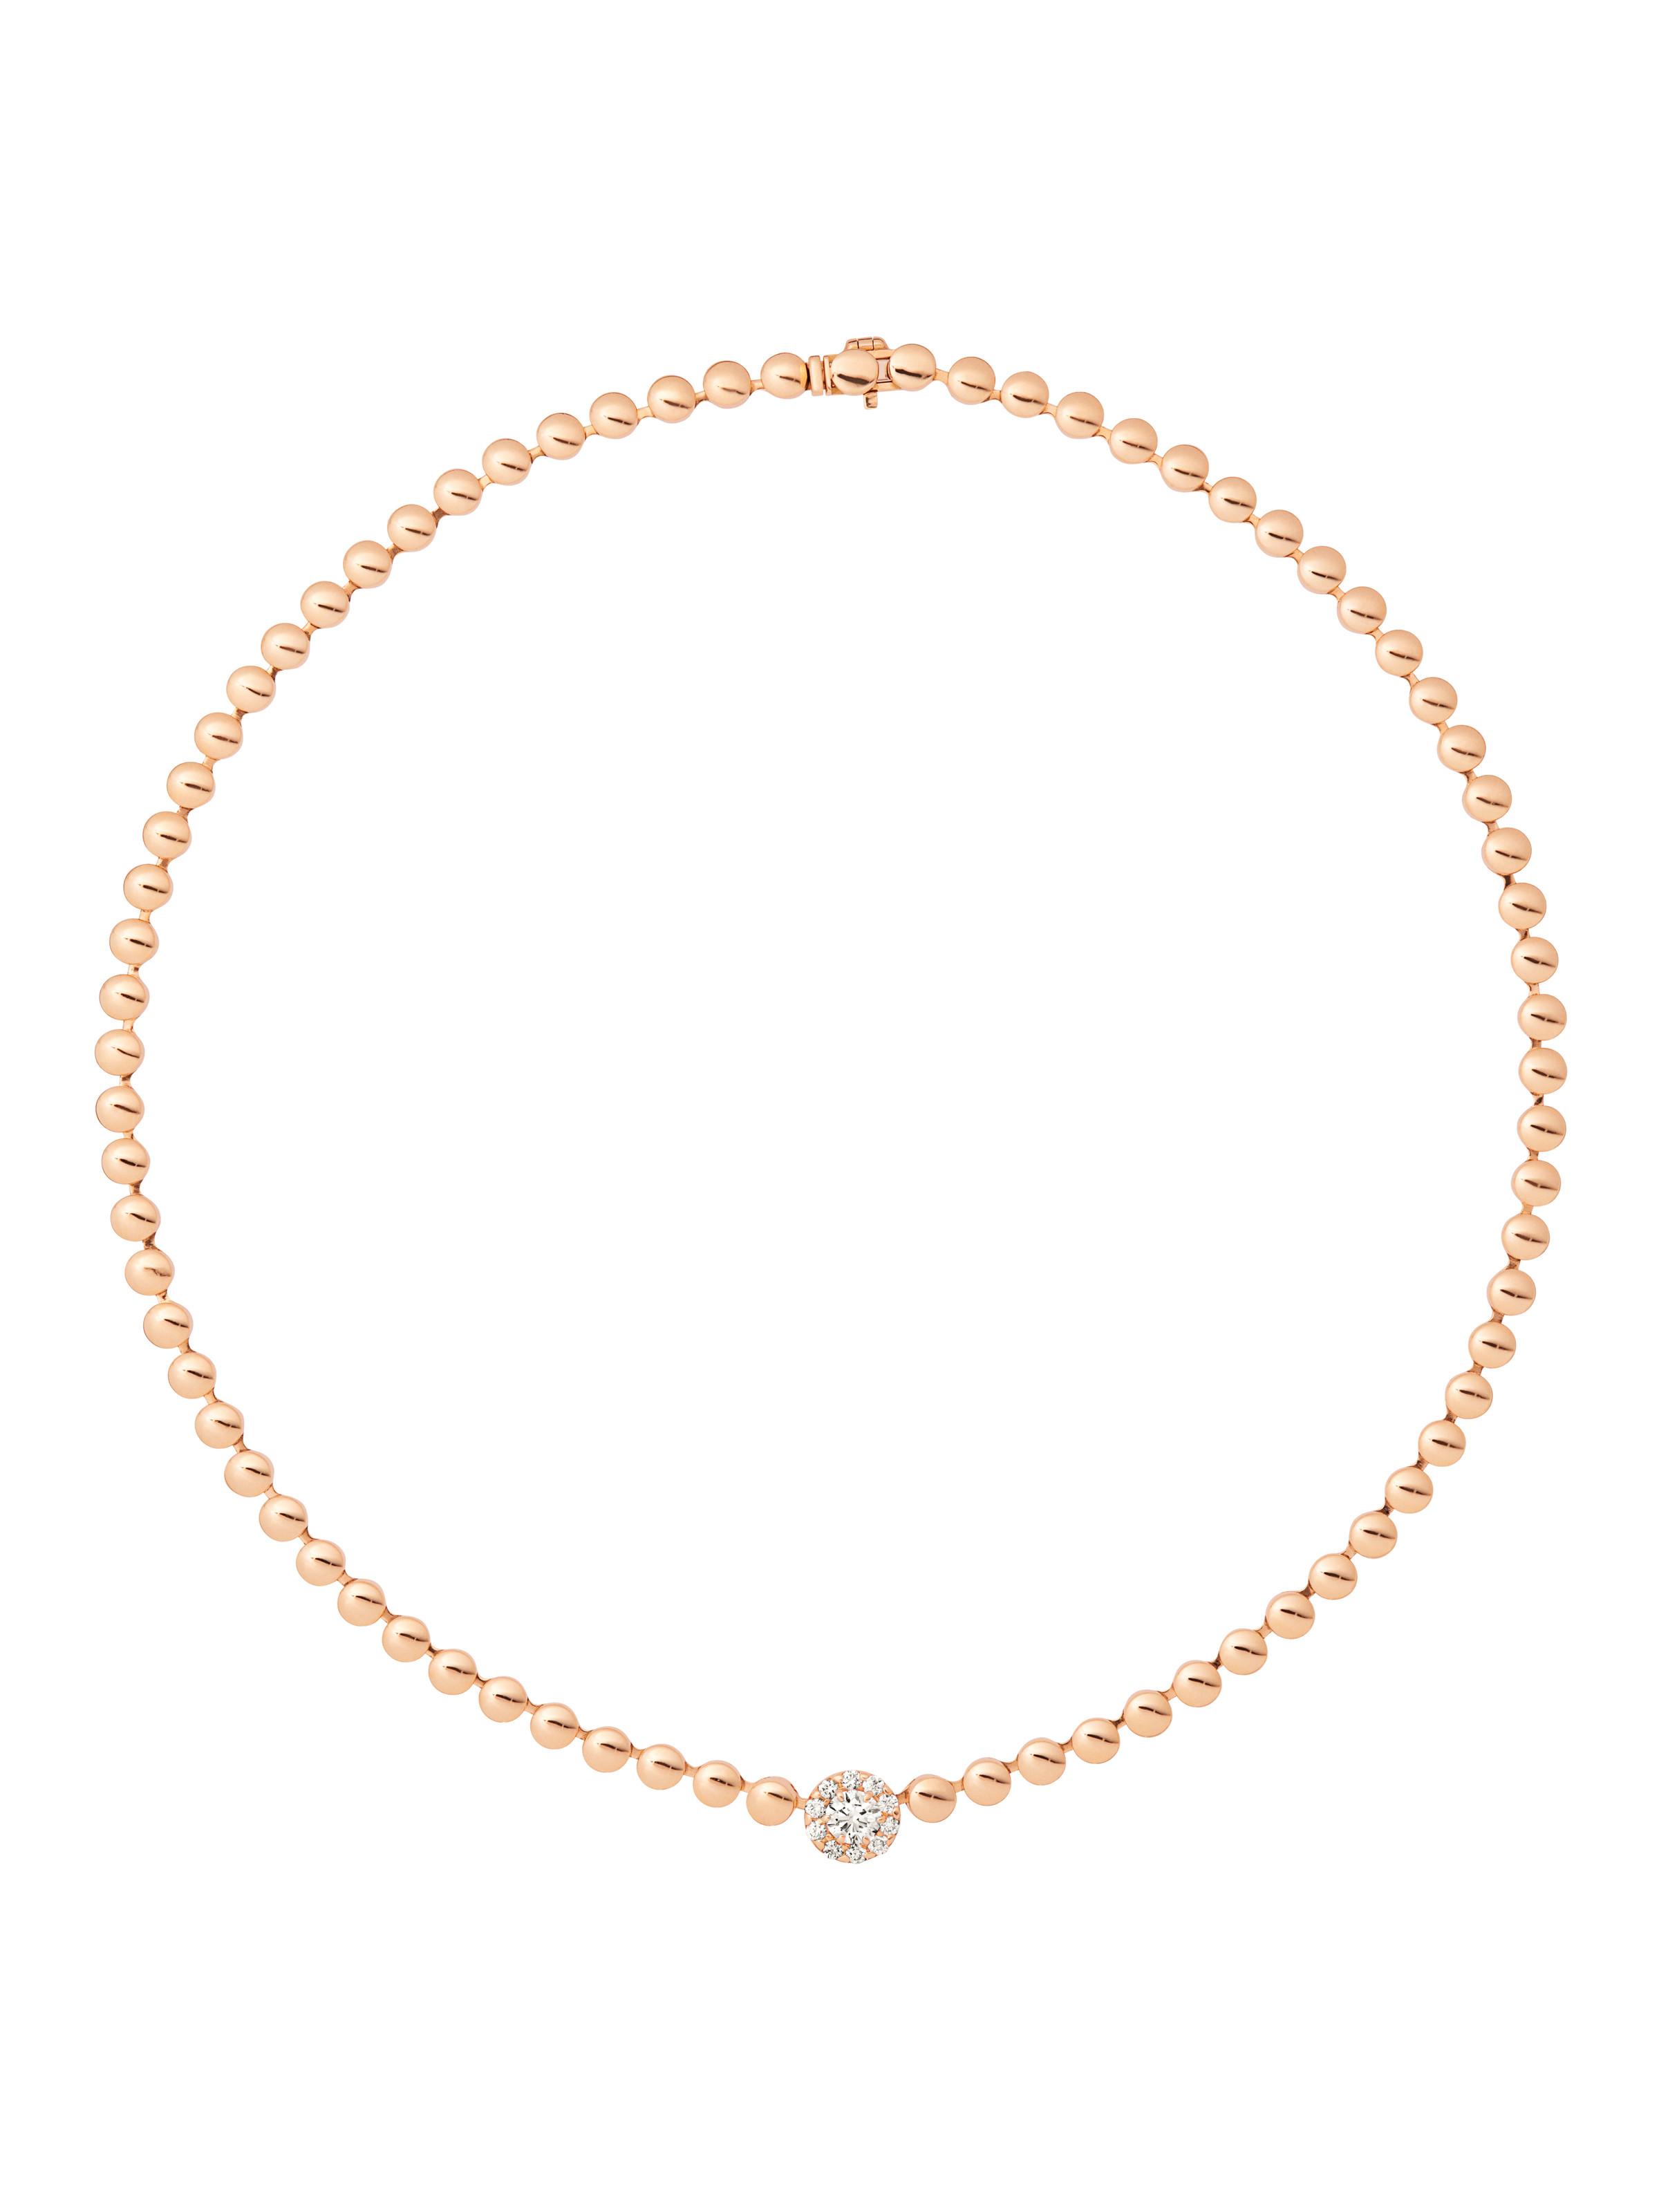 Blu Crown necklace